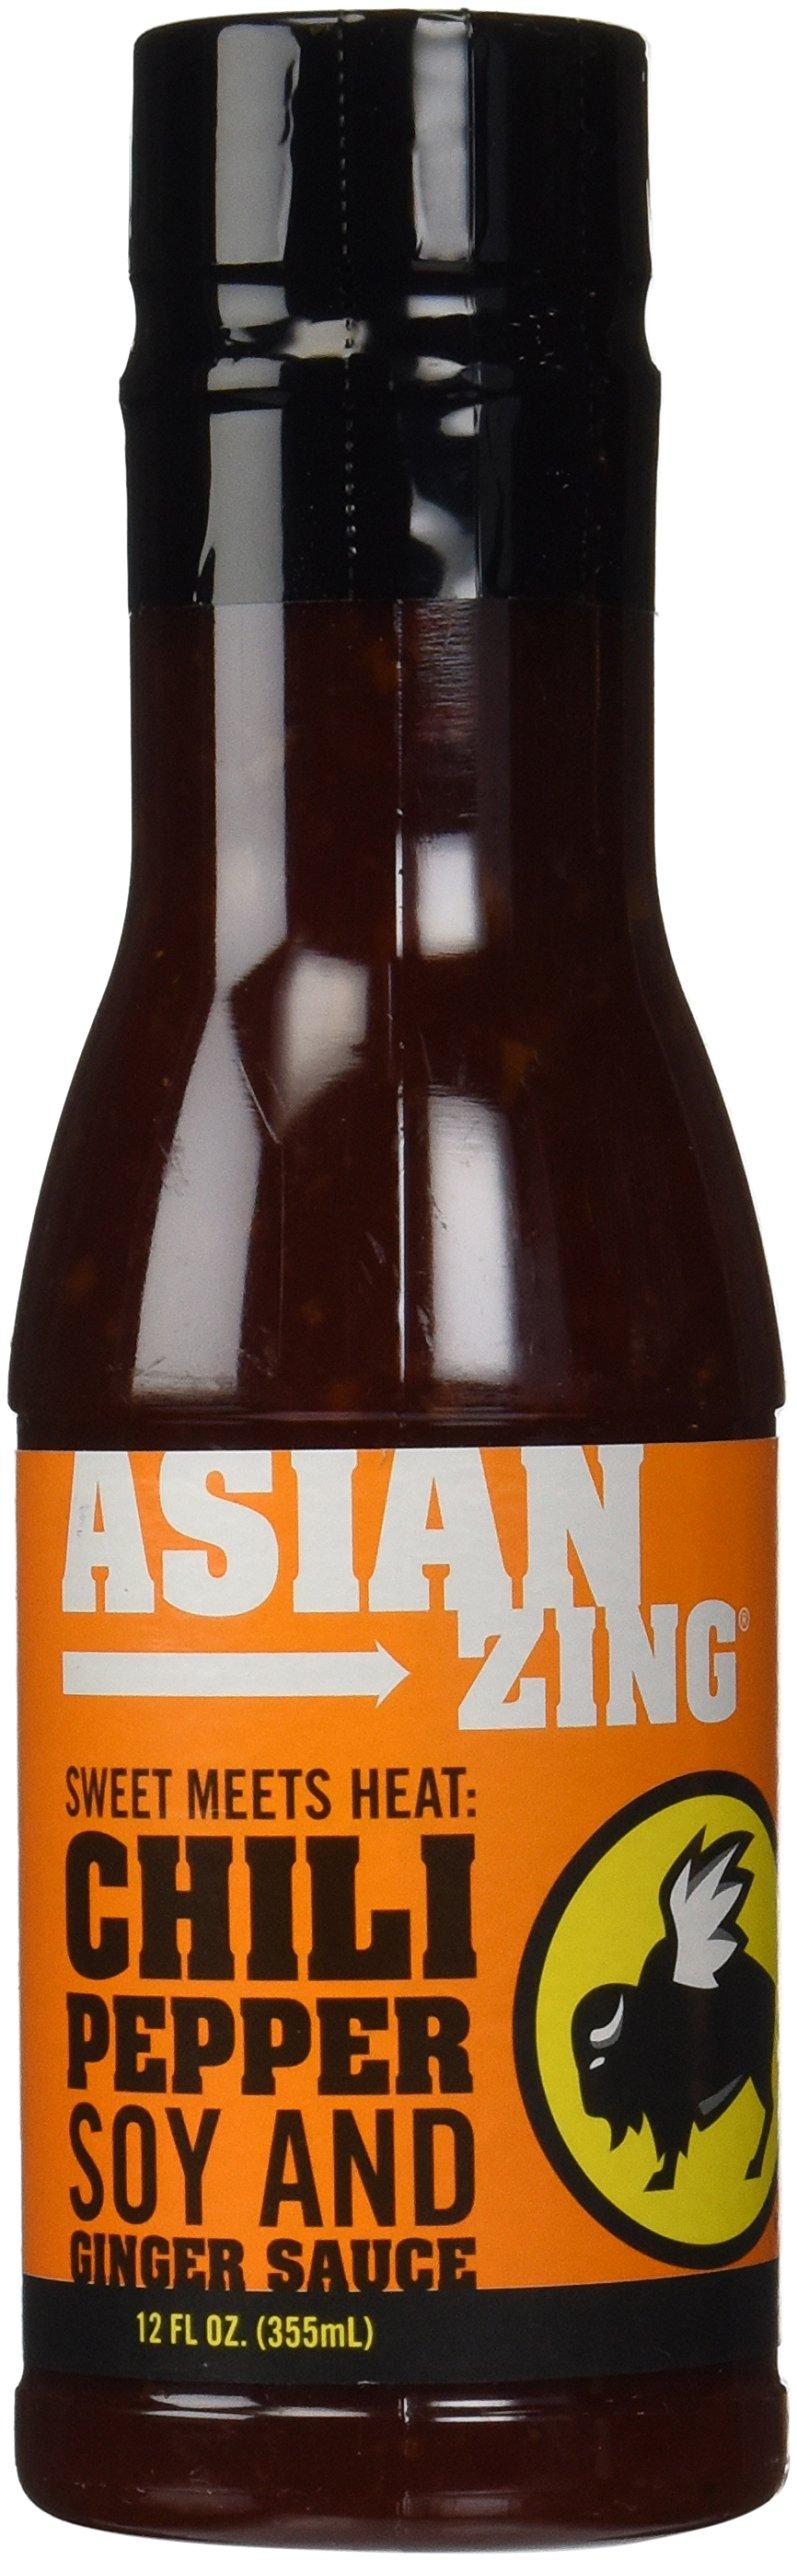 Asian ginger sauce — img 15